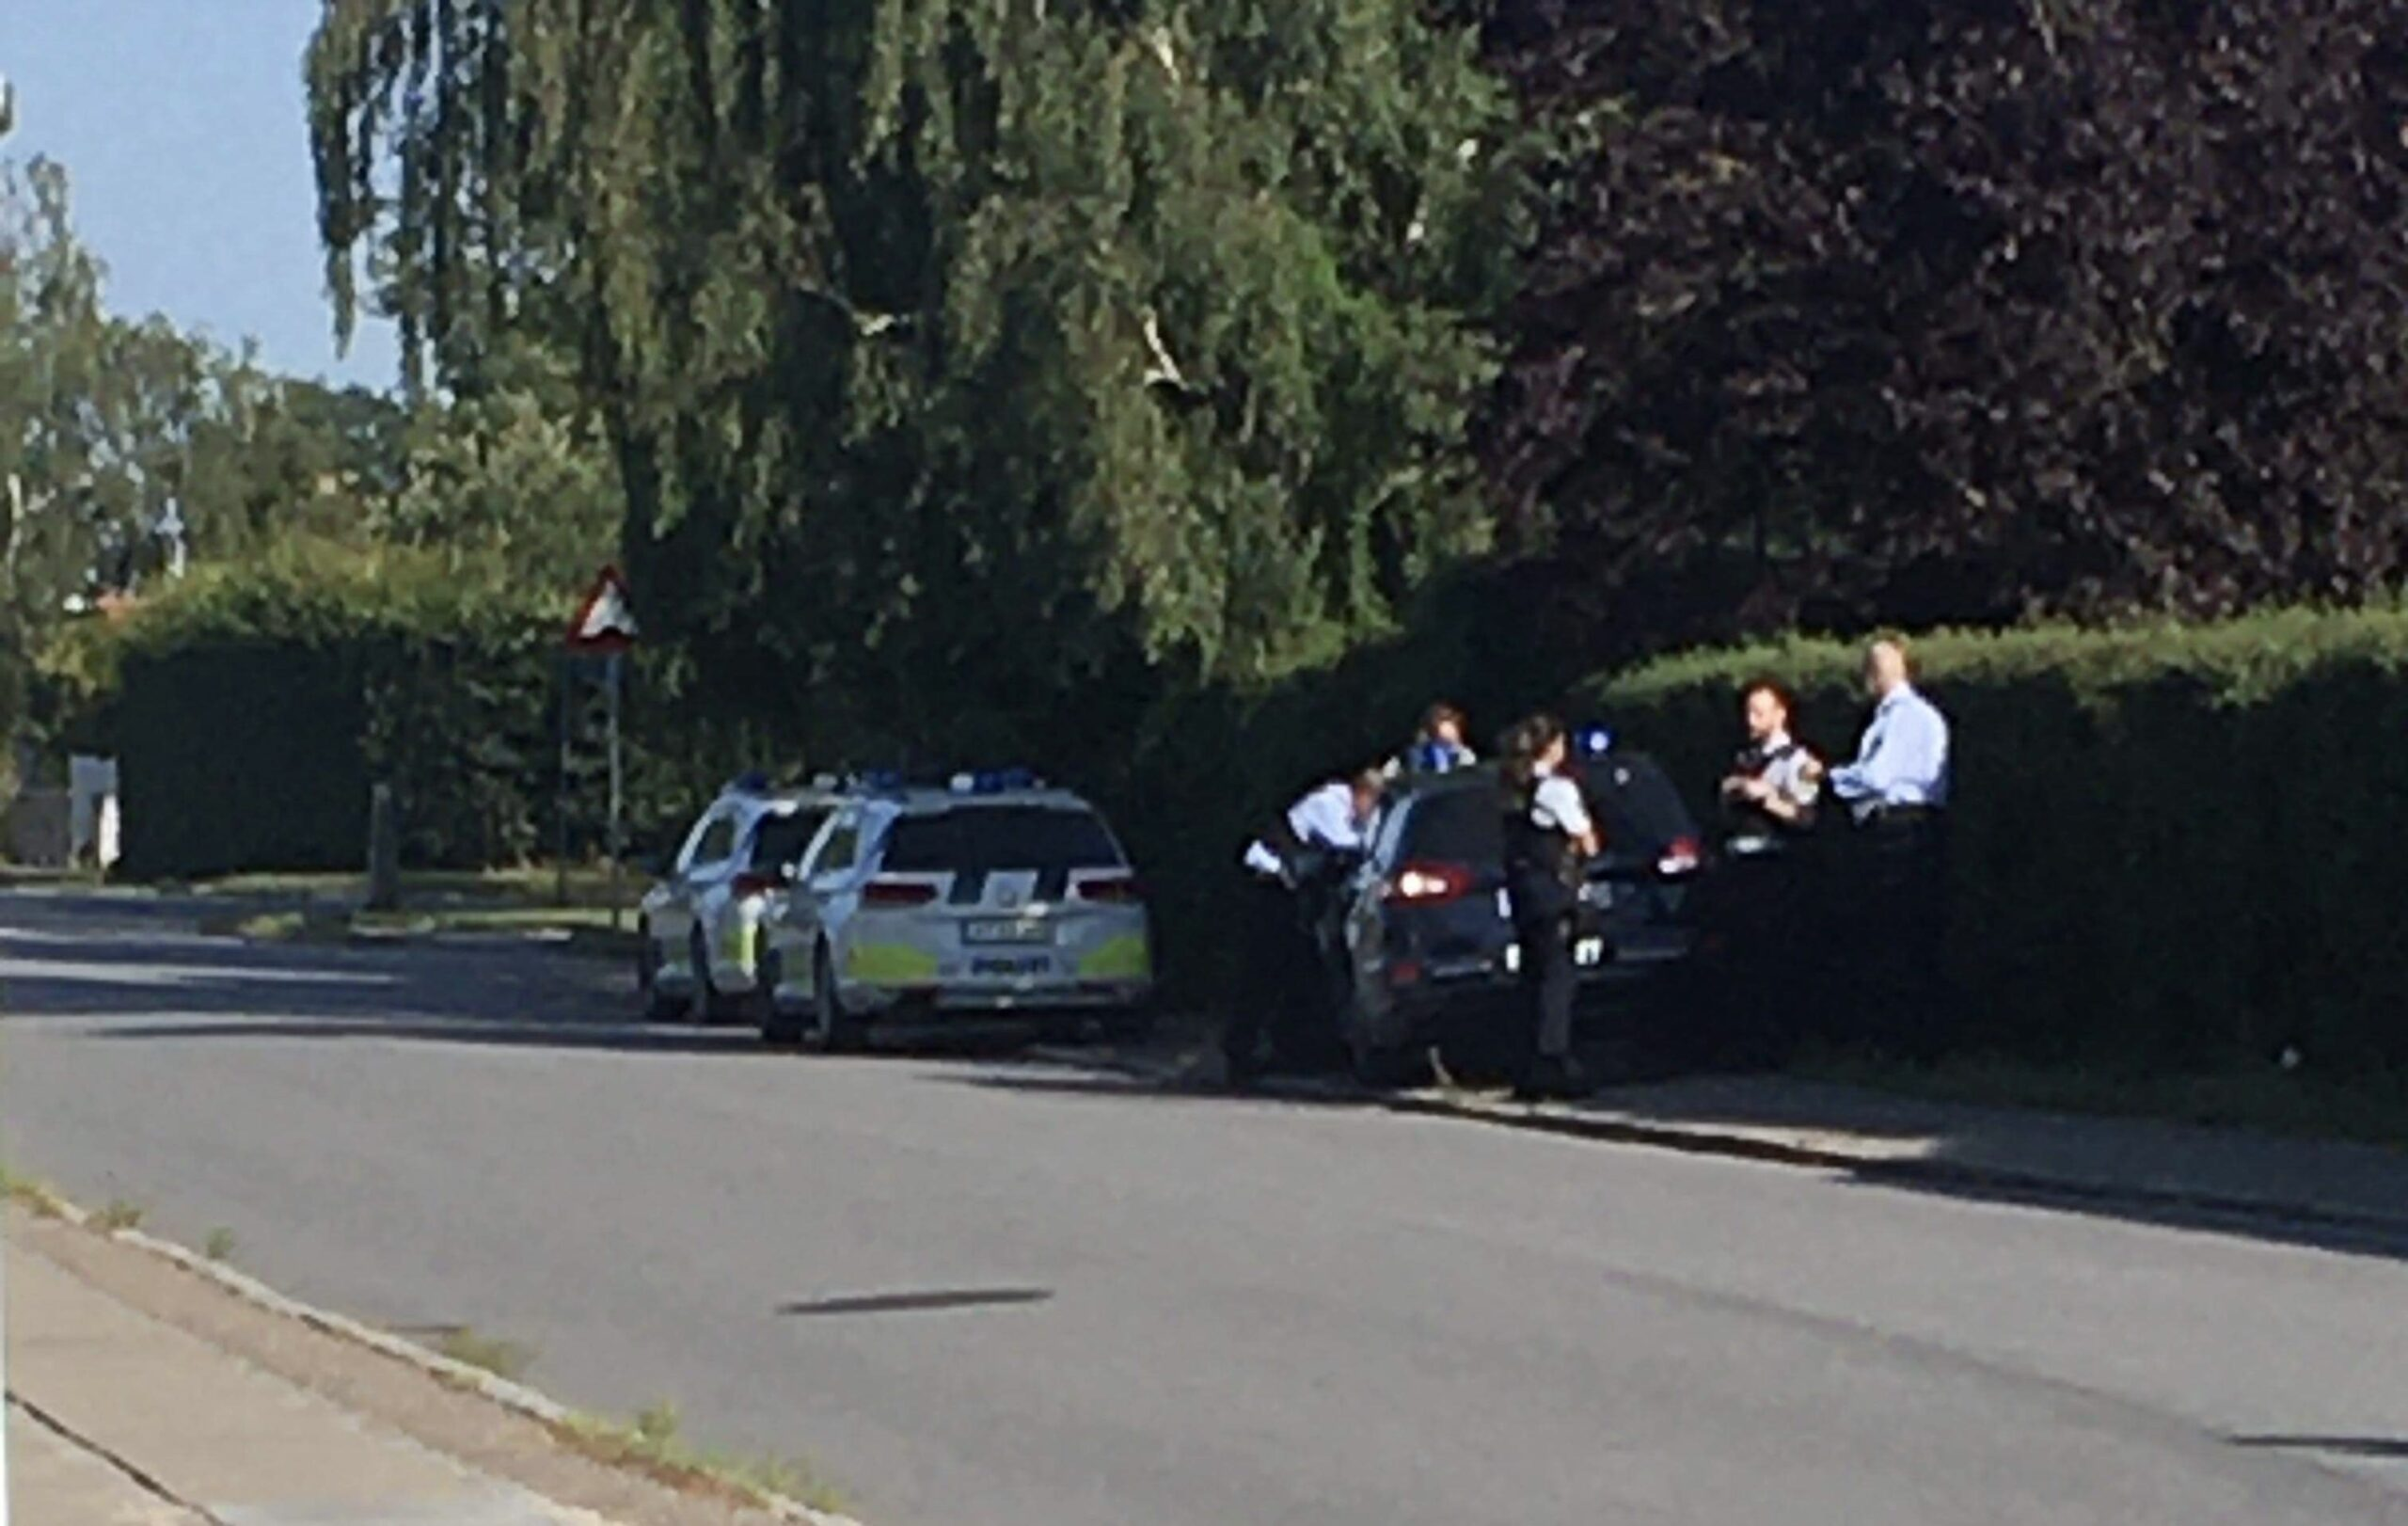 Politiaktion i Veksø